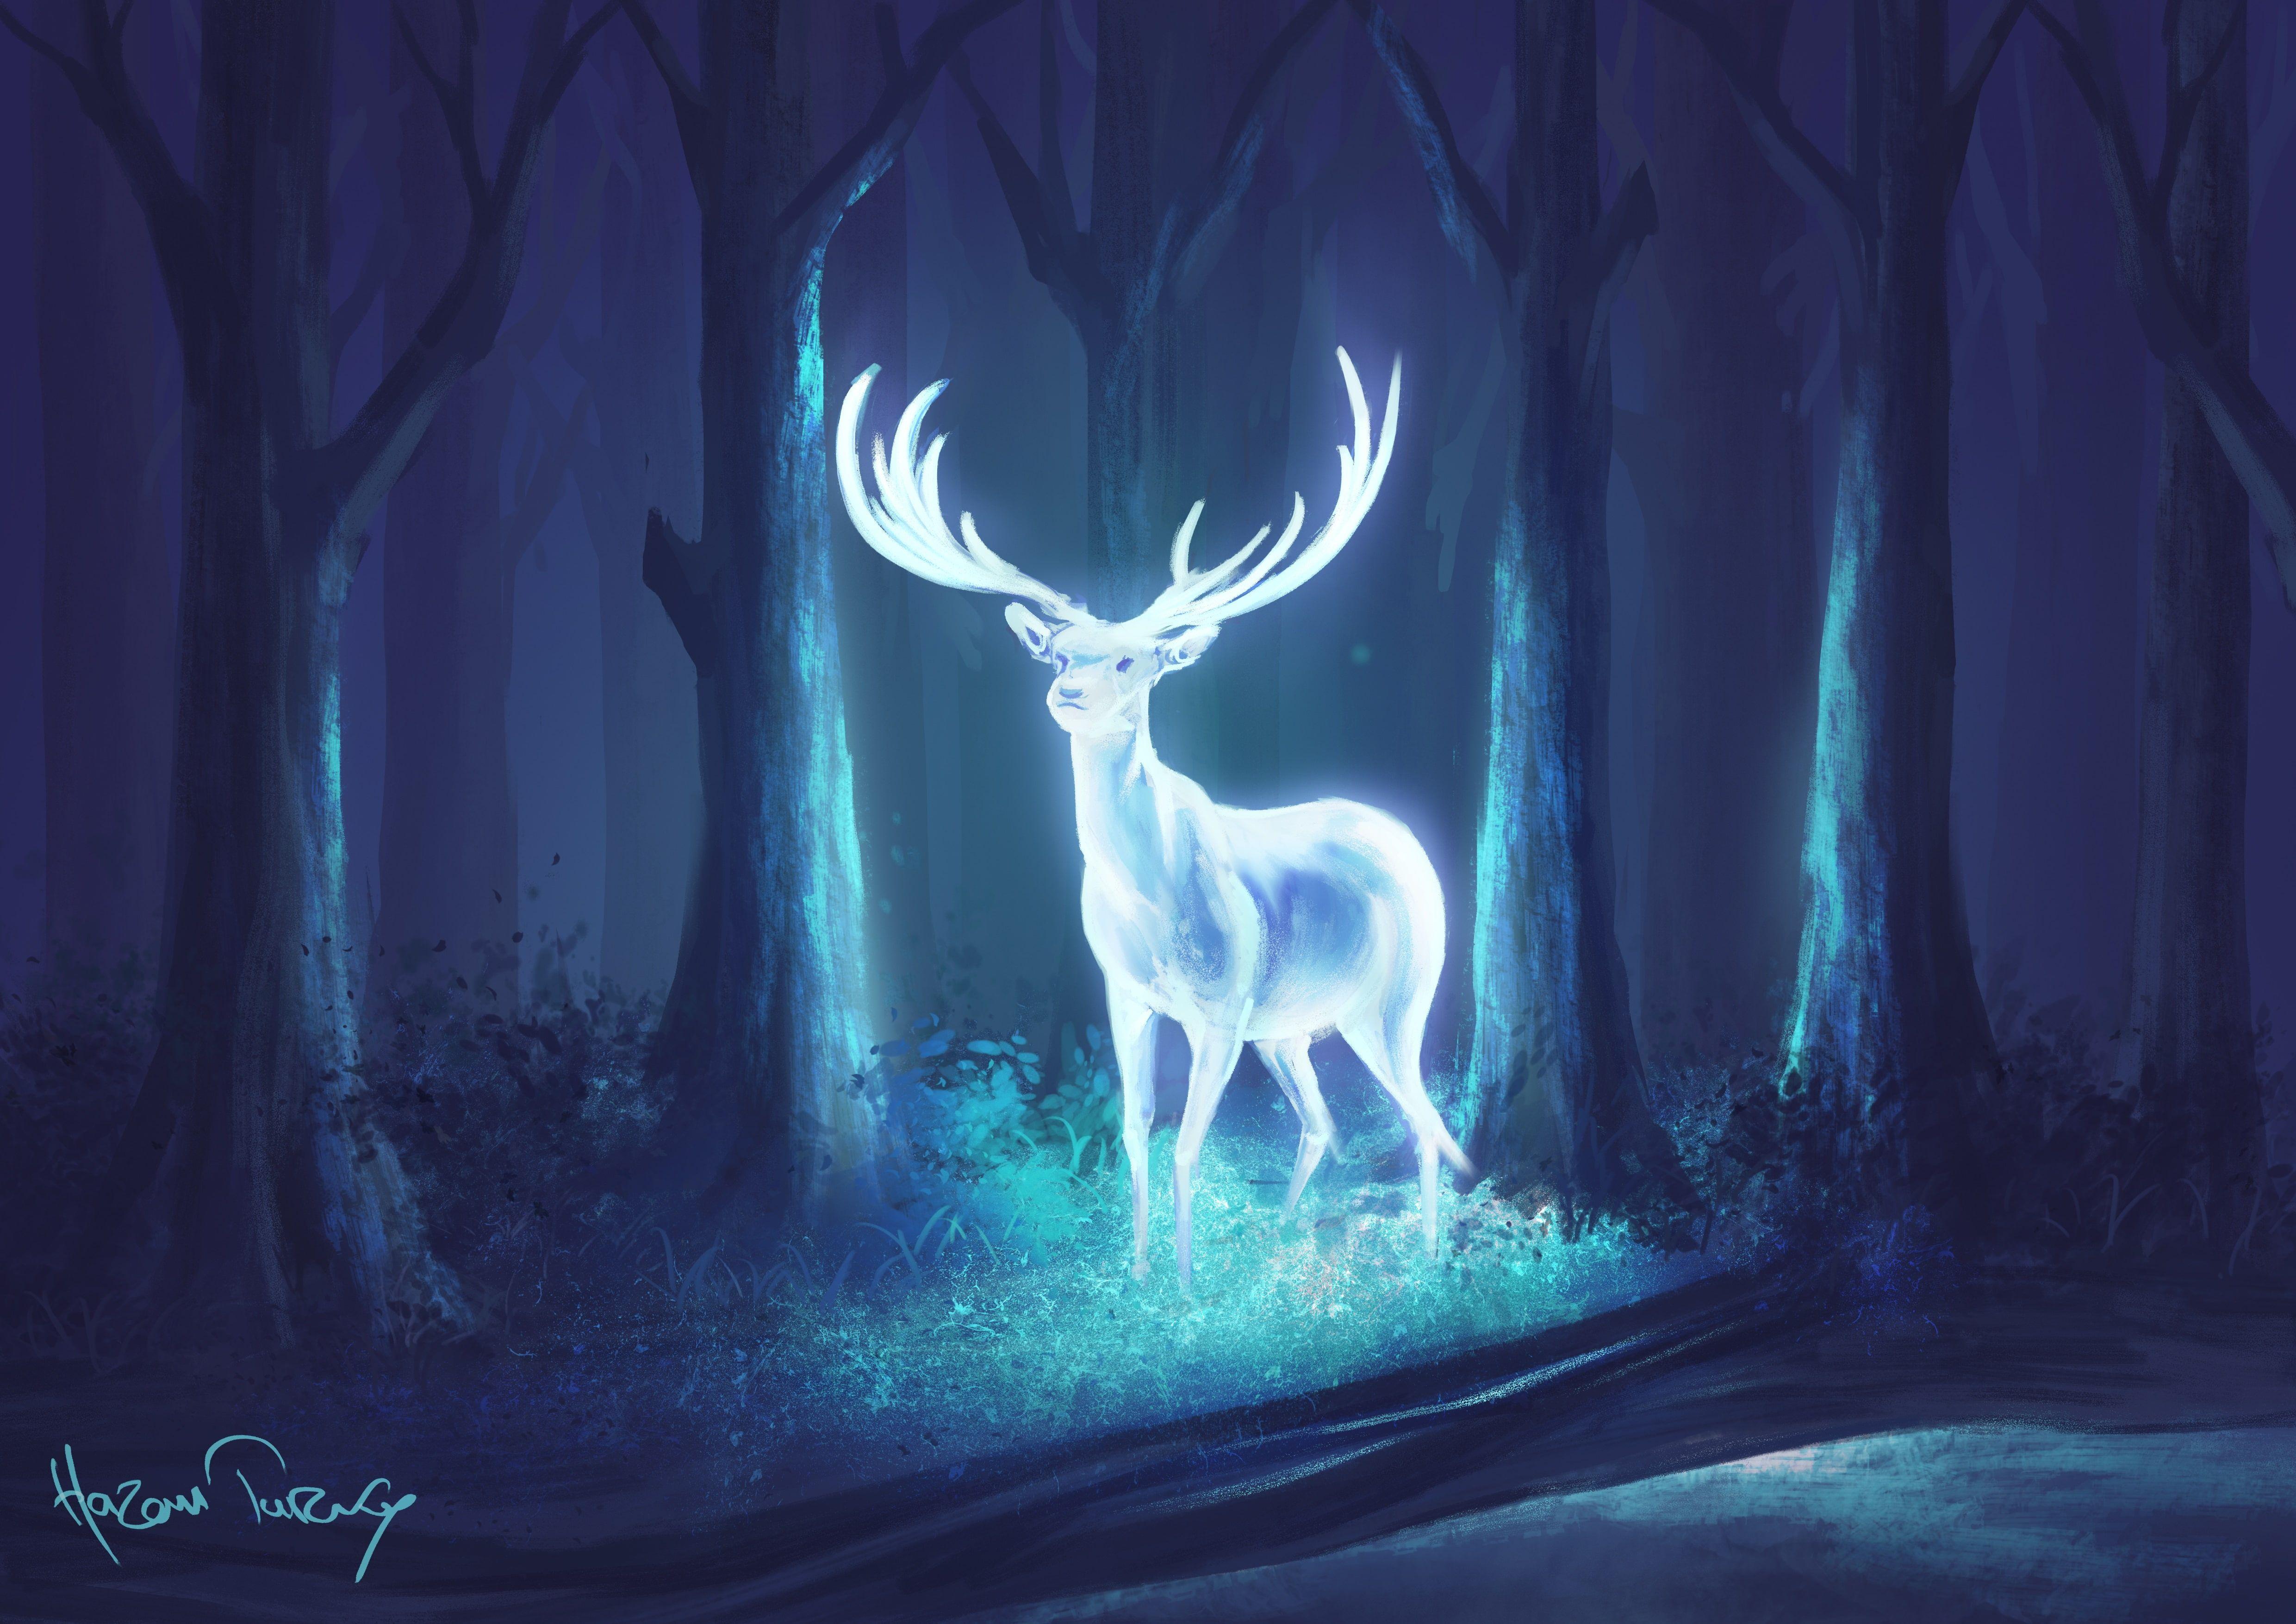 Digital Art Deer Forest Neon Fantasy Art Blue 4k Wallpaper Hdwallpaper Desktop In 2020 Harry Potter Drawings Harry Potter Painting Harry Potter Wallpaper